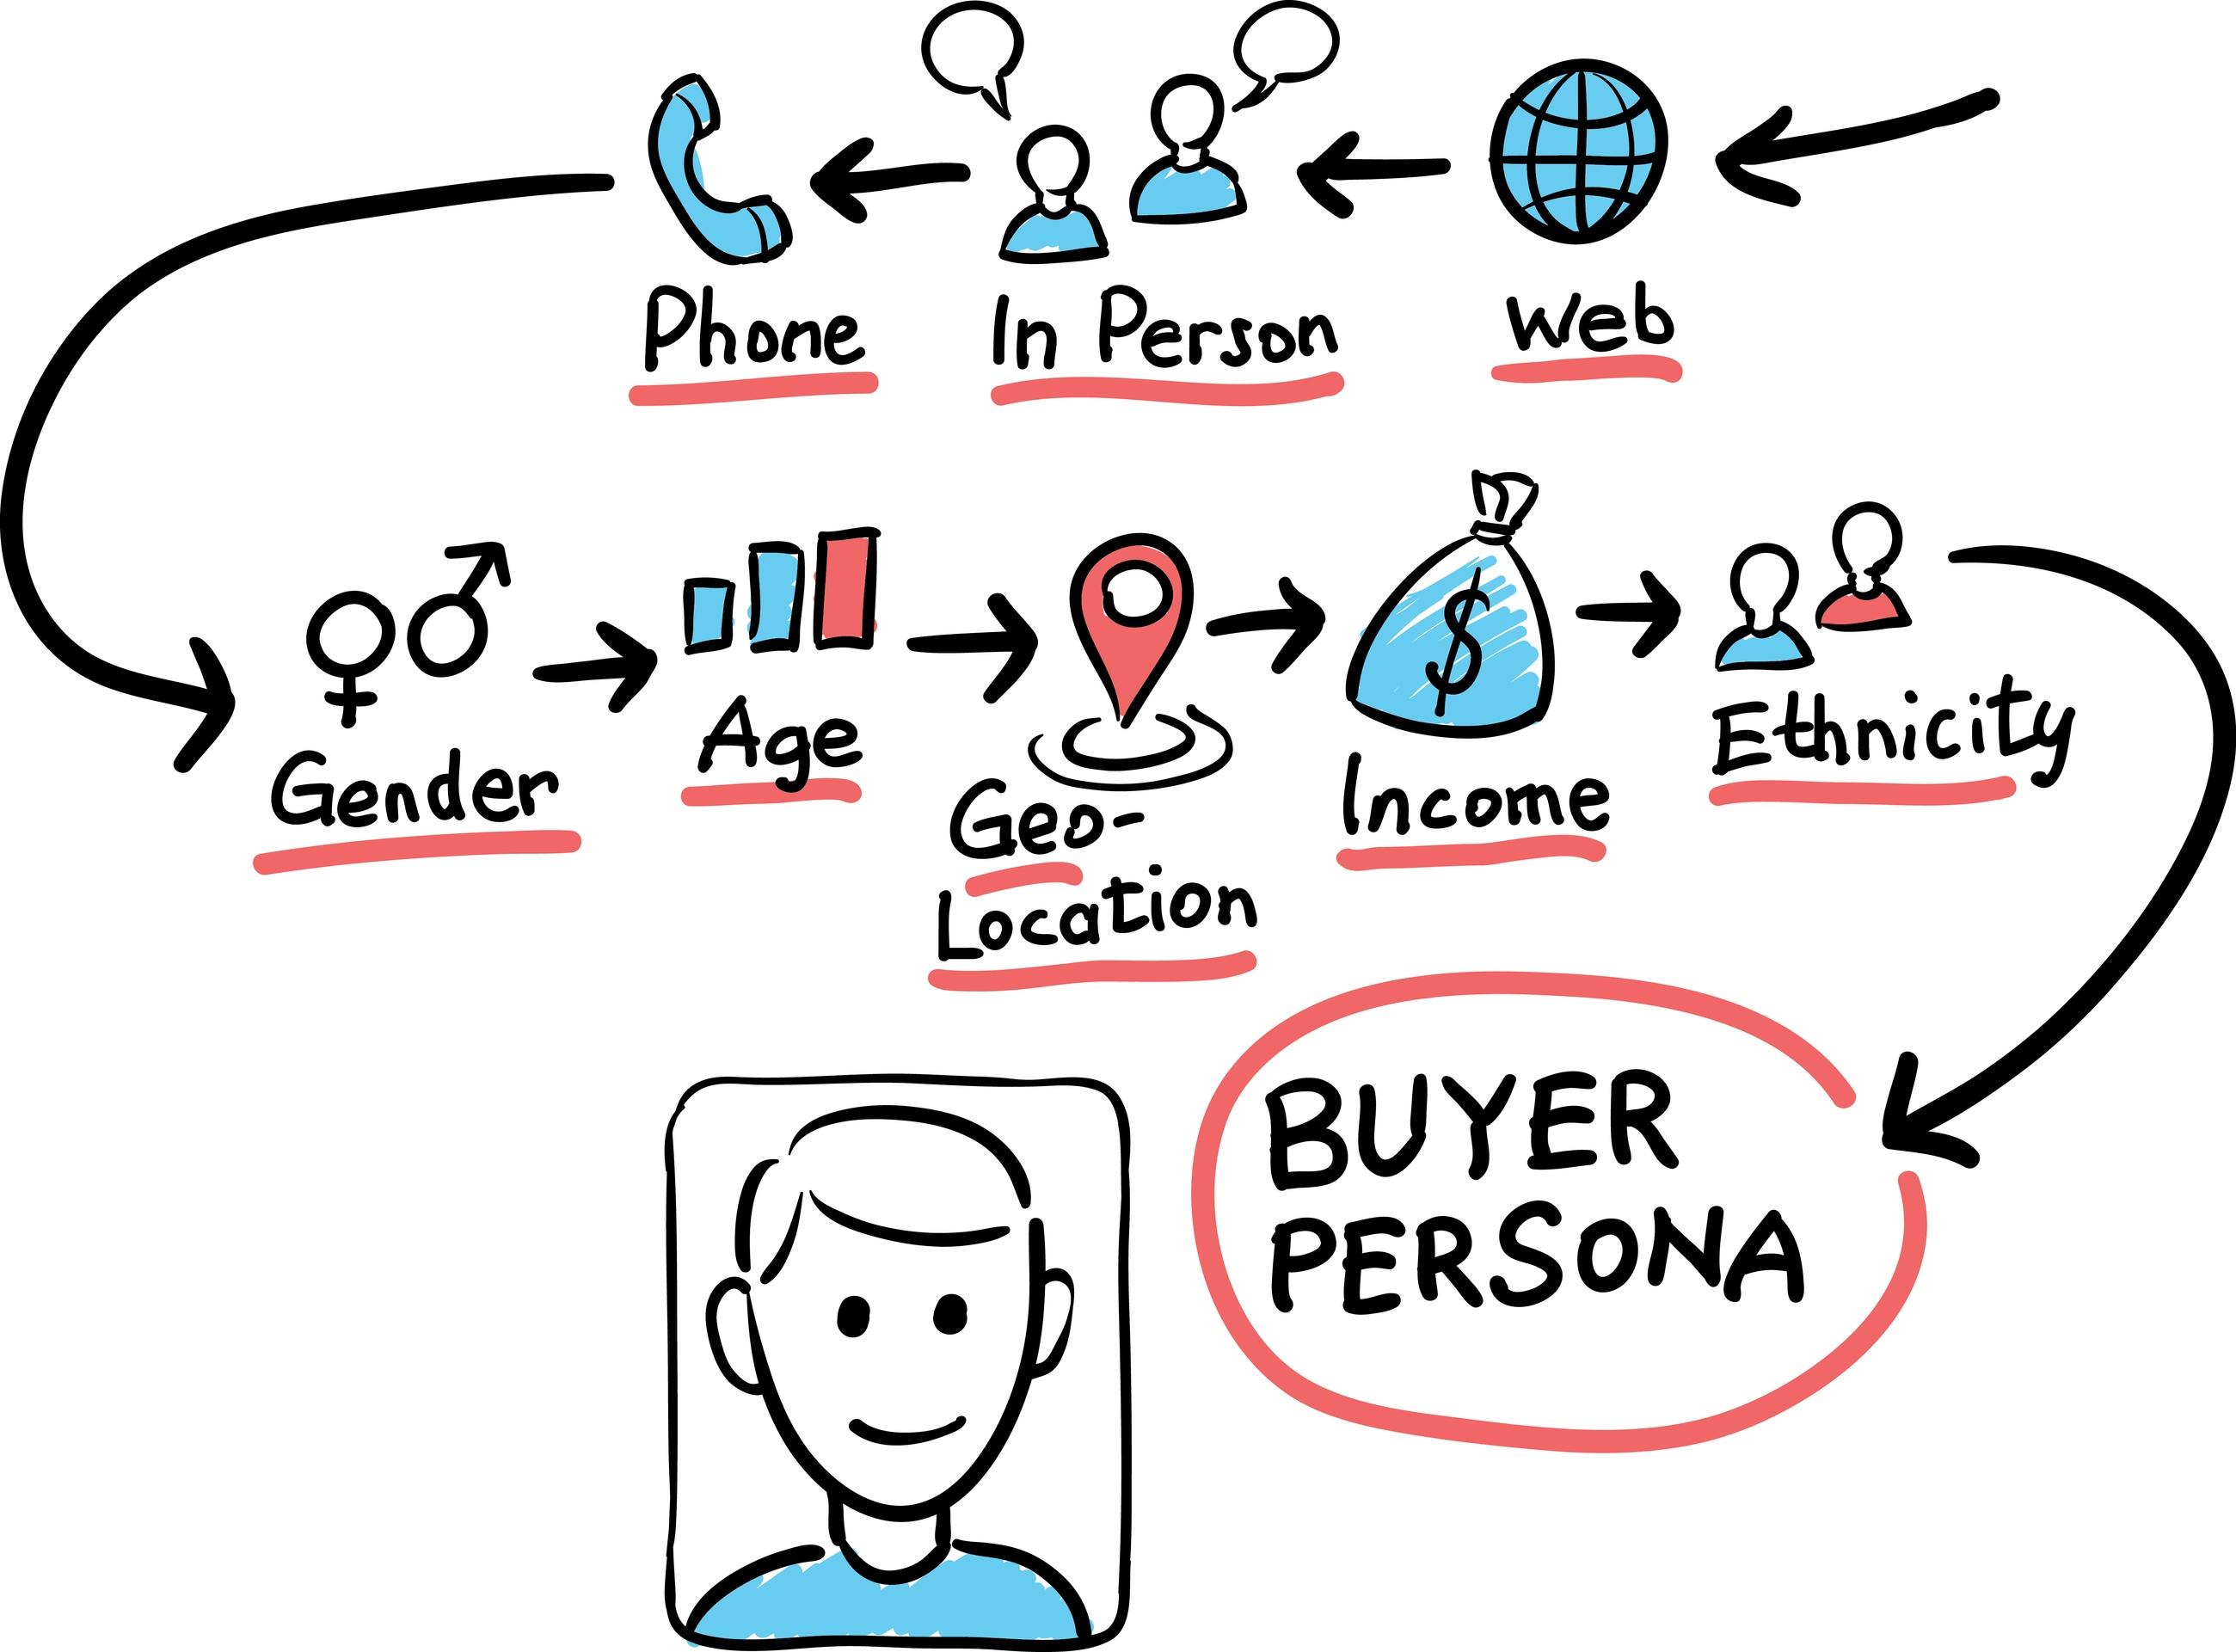 dreamstime_l_Buyer Persona